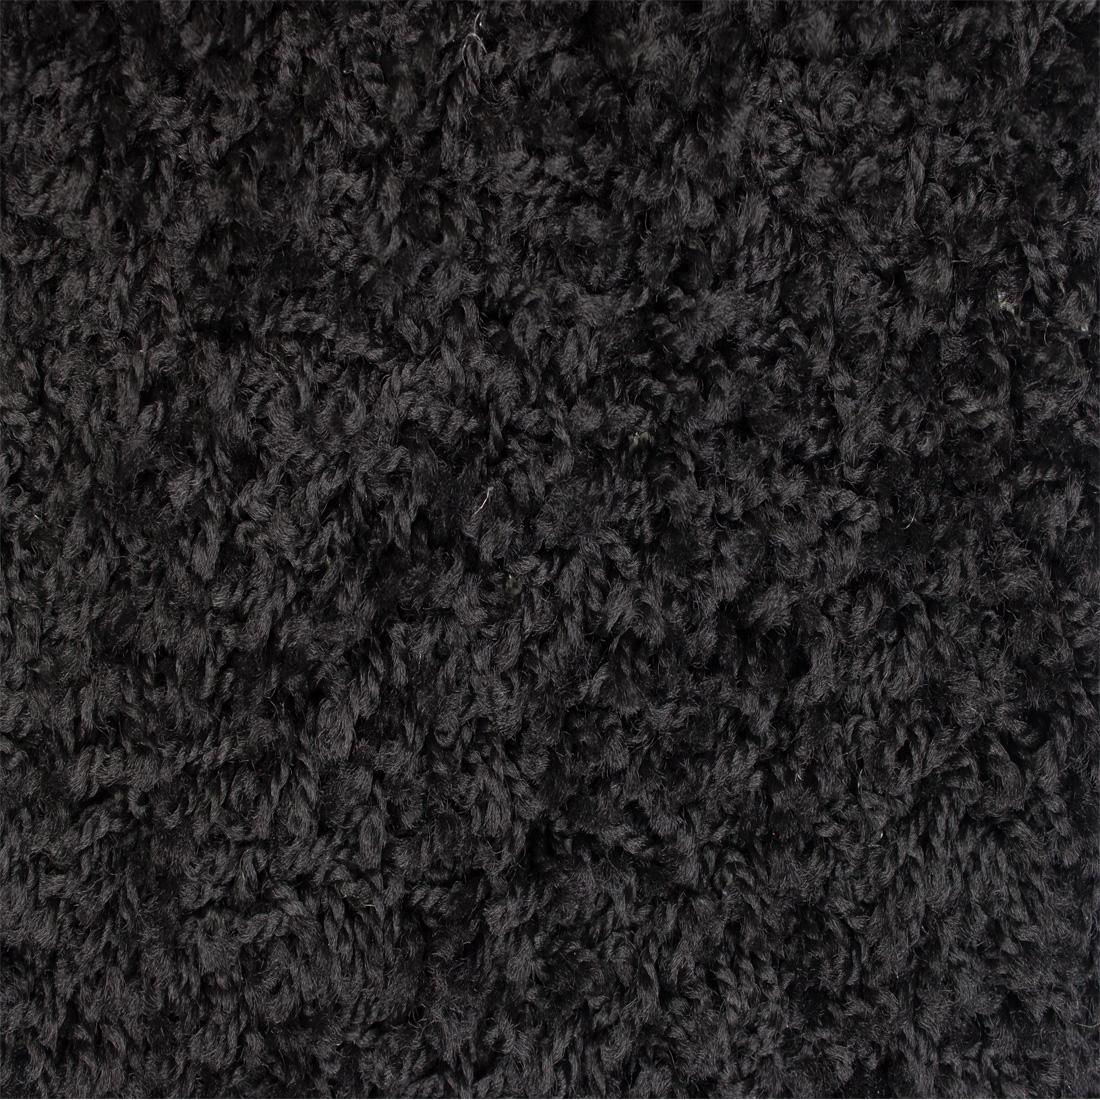 Vloerkleed Miami Zwart | 170 x 230 cm